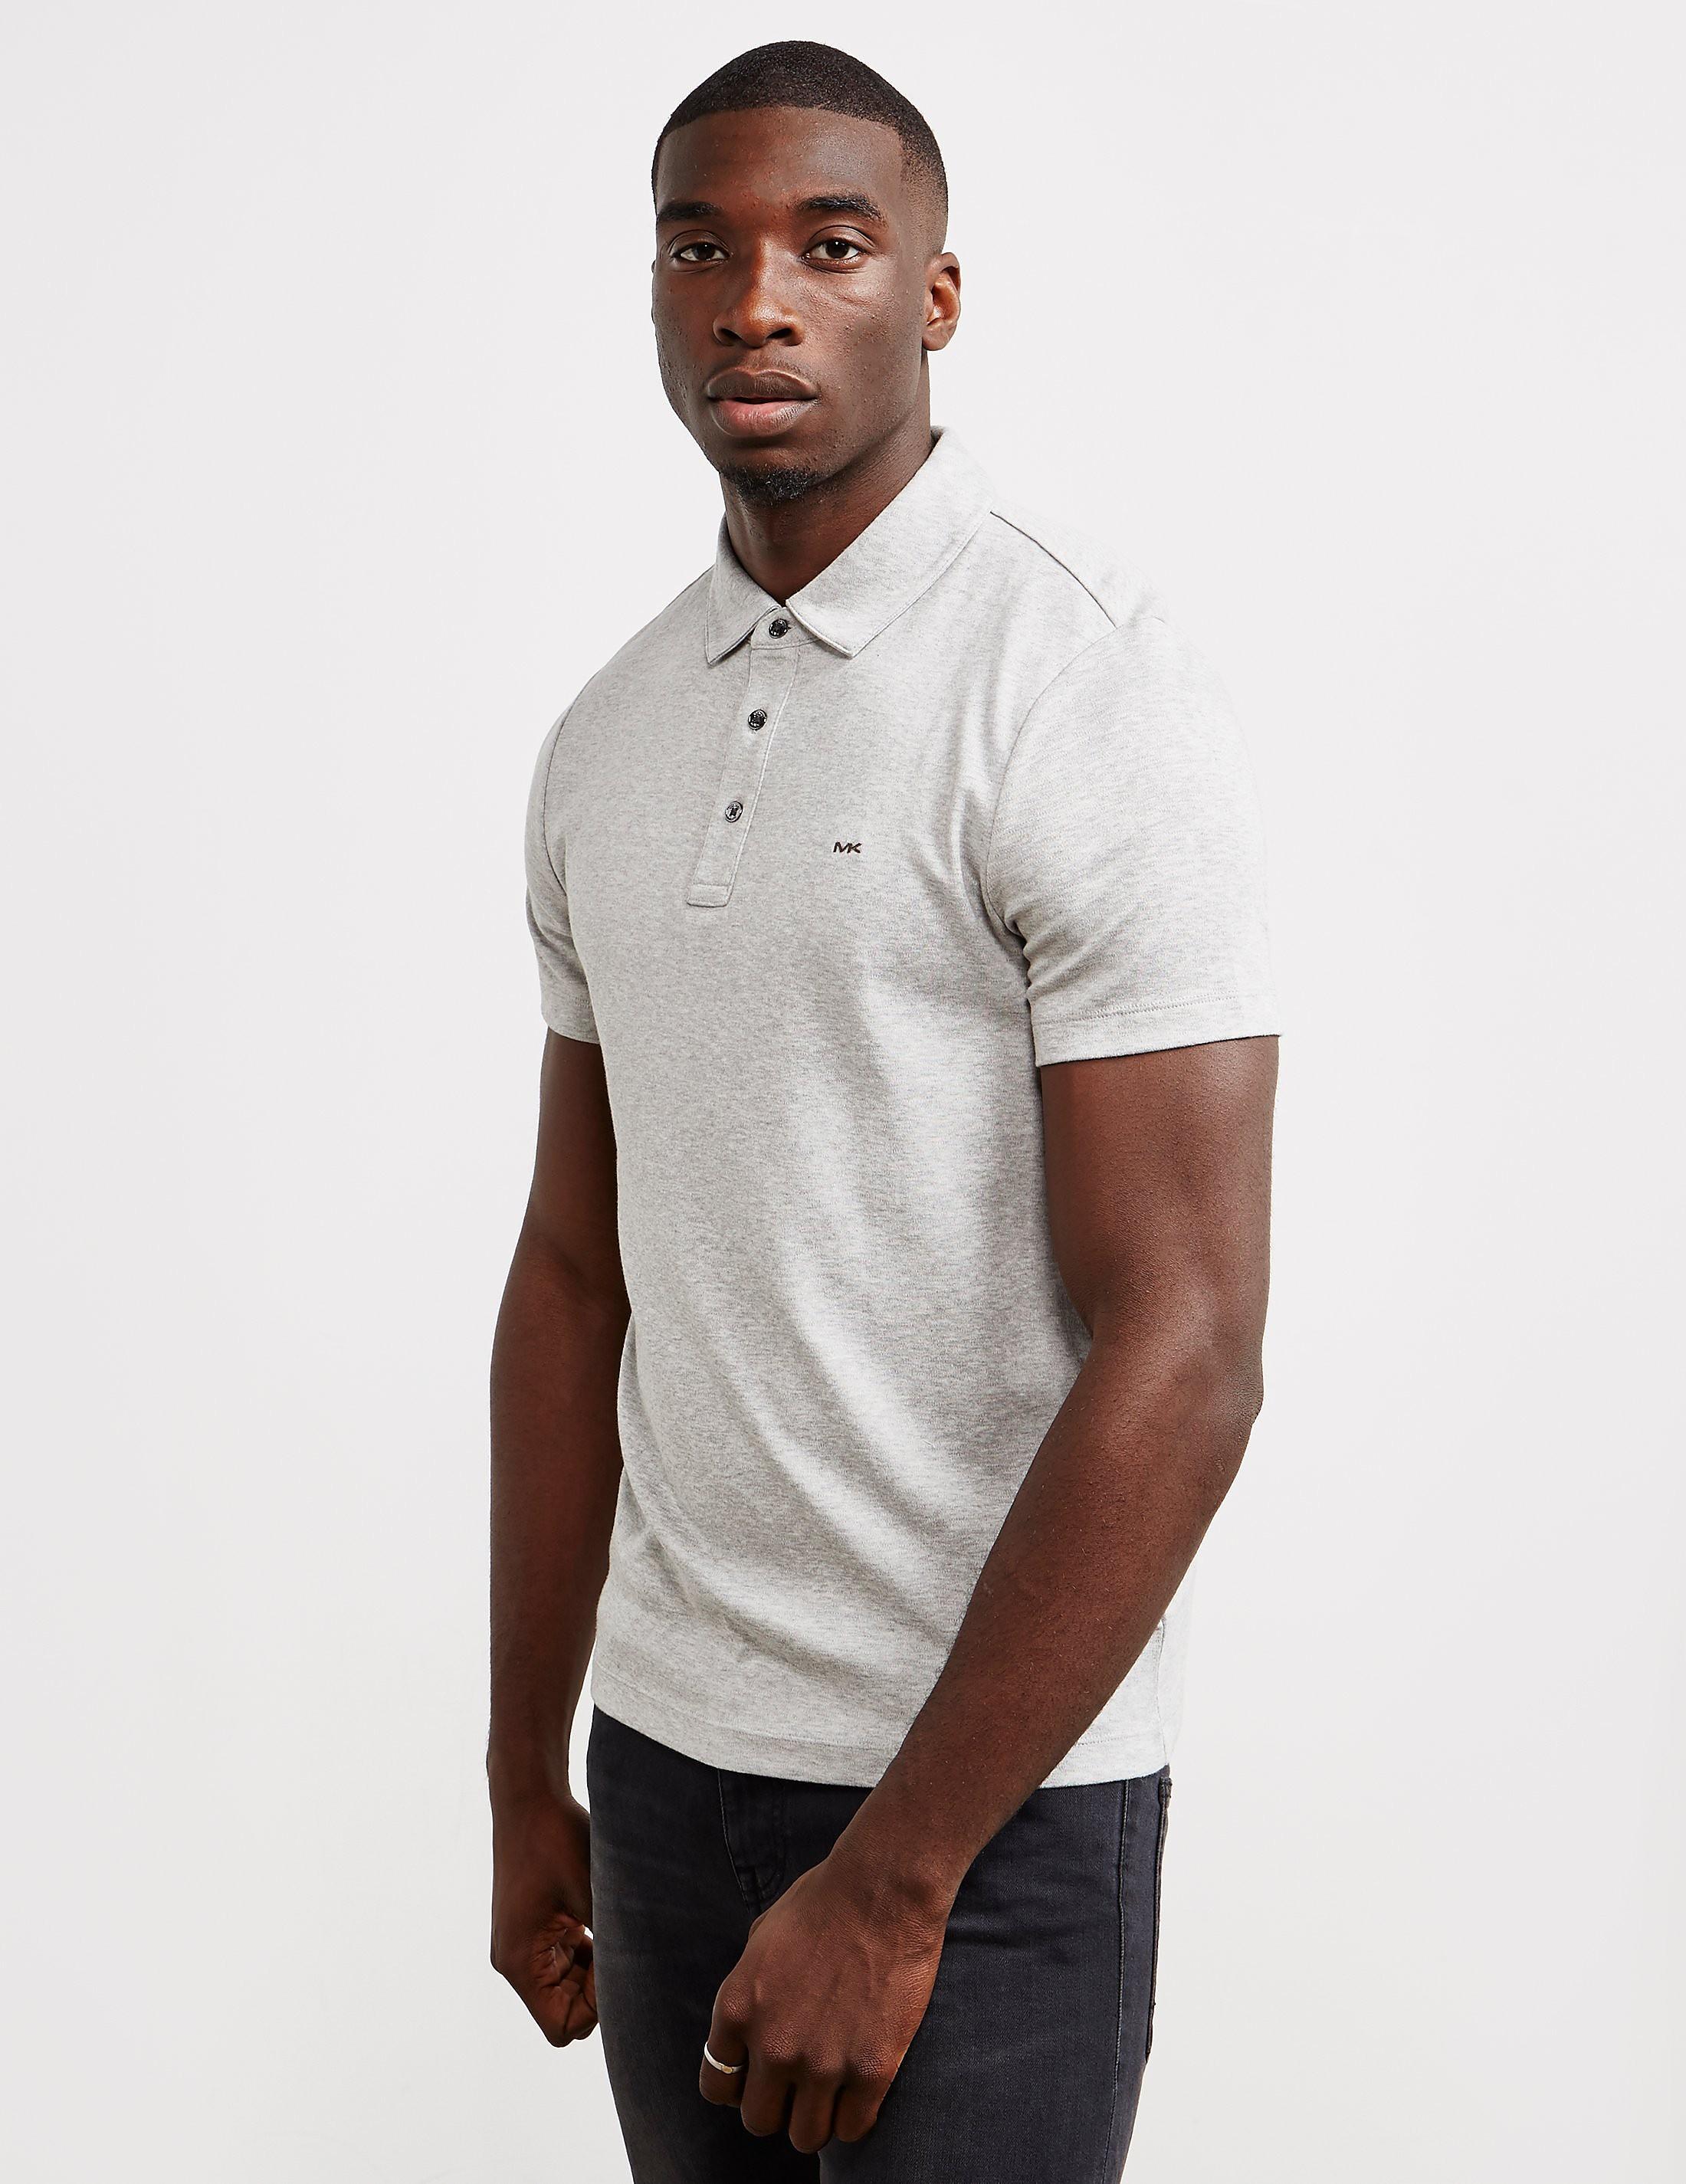 9c262cae8 Mens Michael Kors Sleek Short Sleeve Polo Shirt Grey